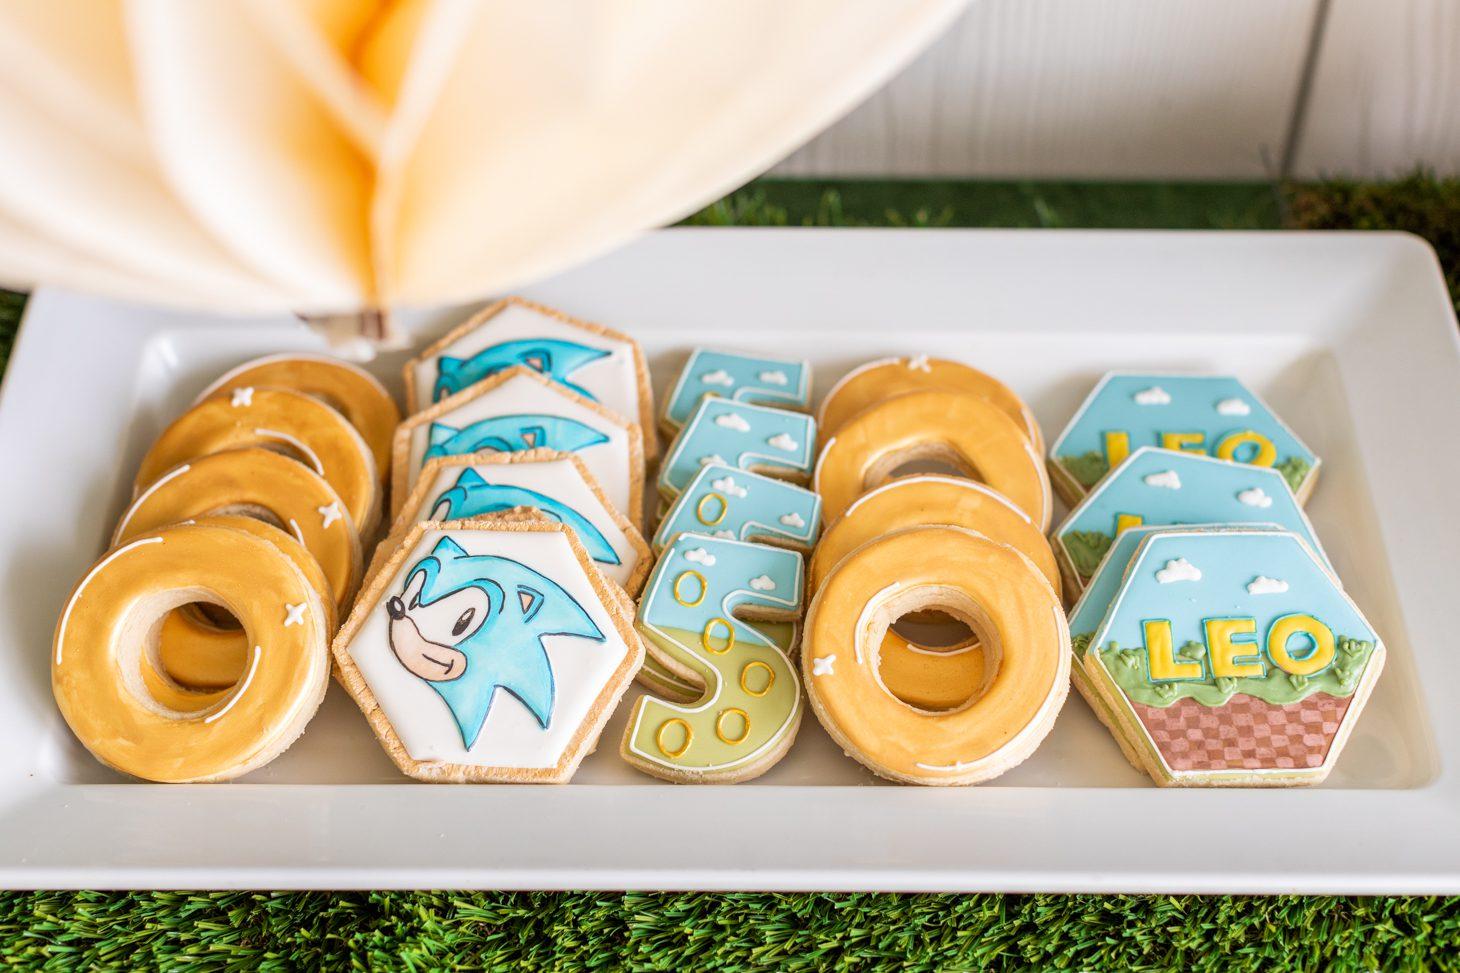 Sonic the Hedgehog themed sugar cookies